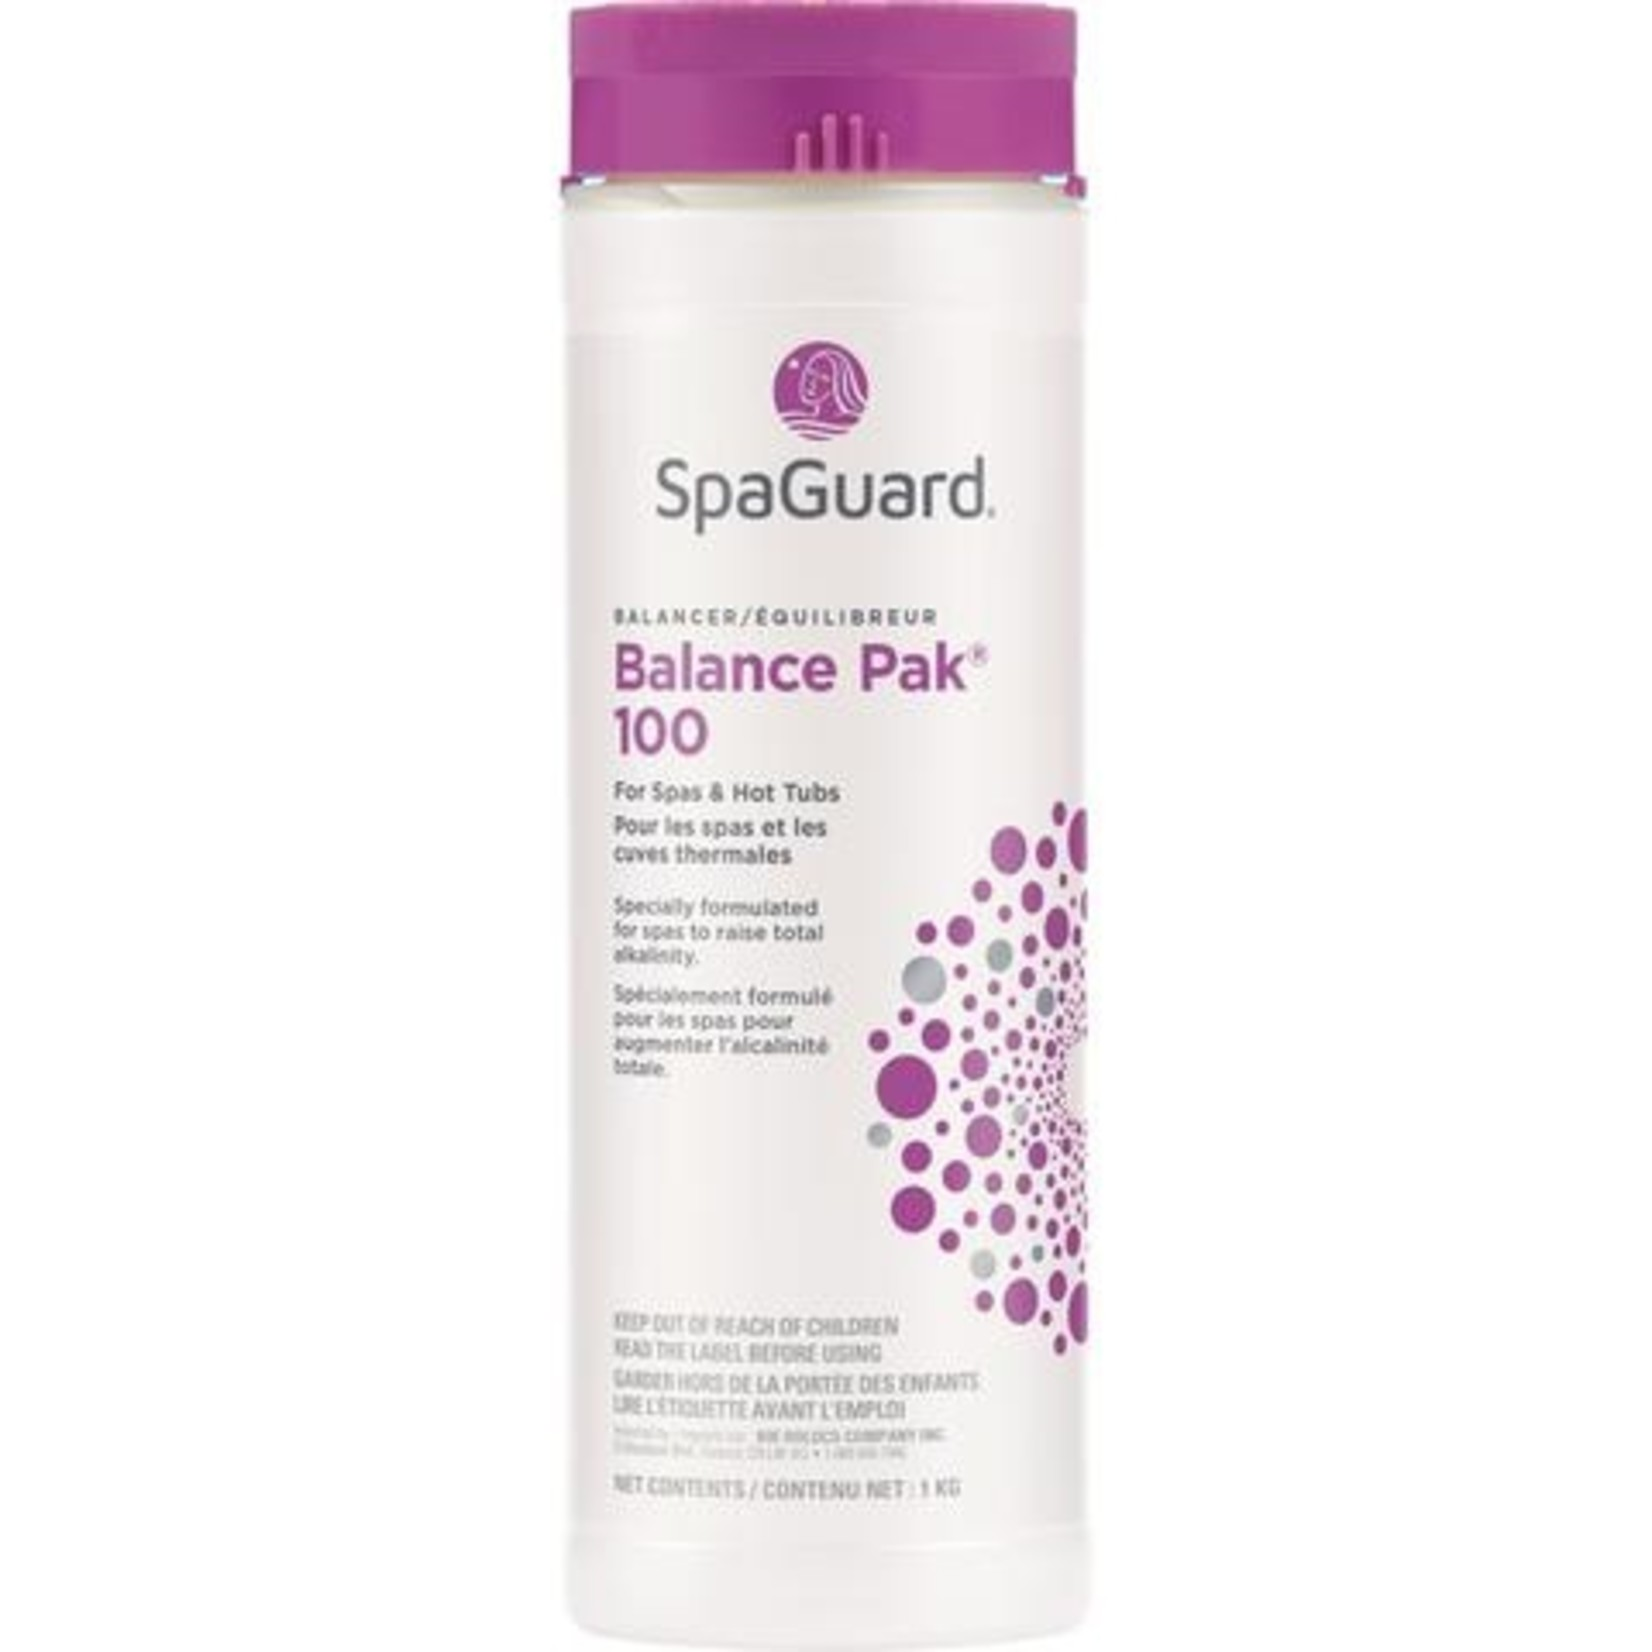 SpaGuard Balance Pak® 100 (1 kg)